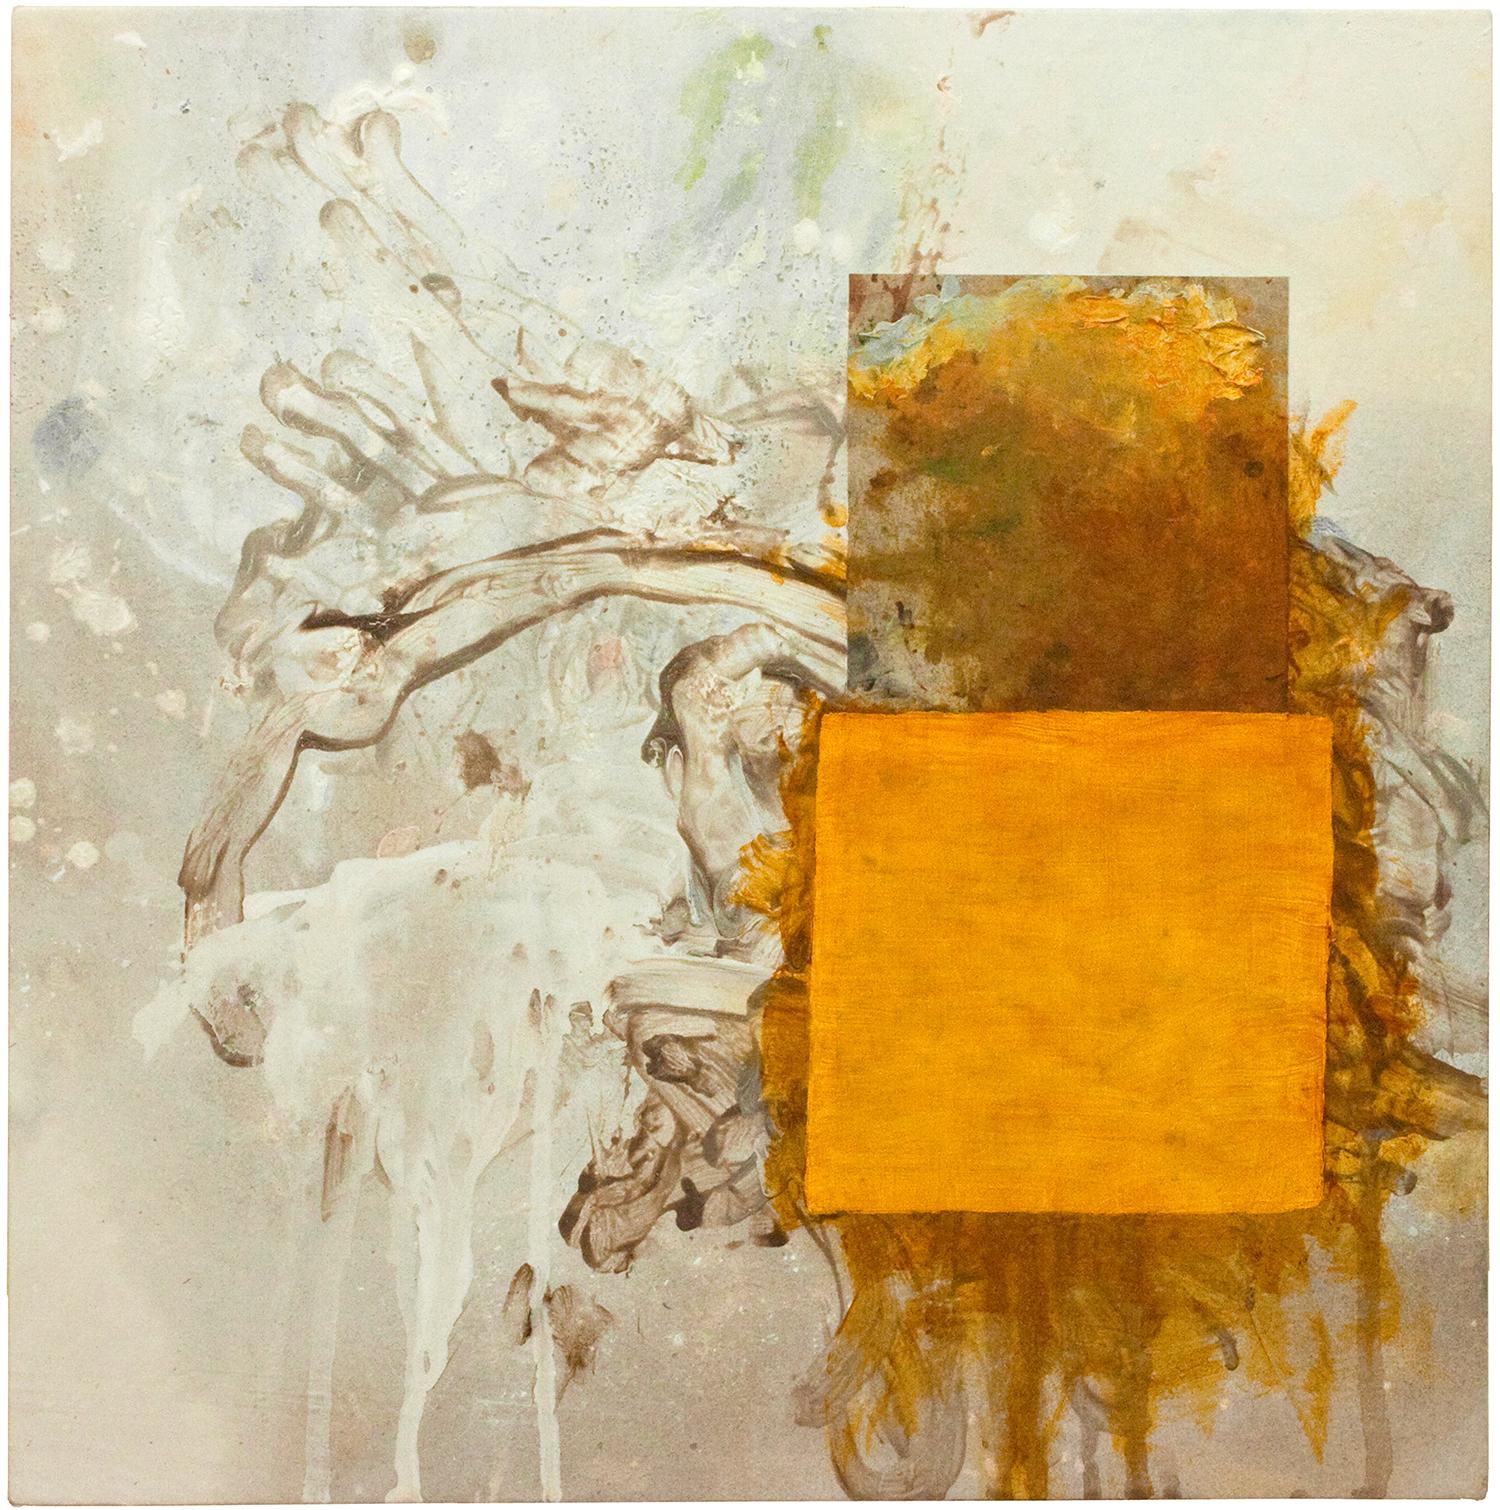 Untitled (squares #7), 2012